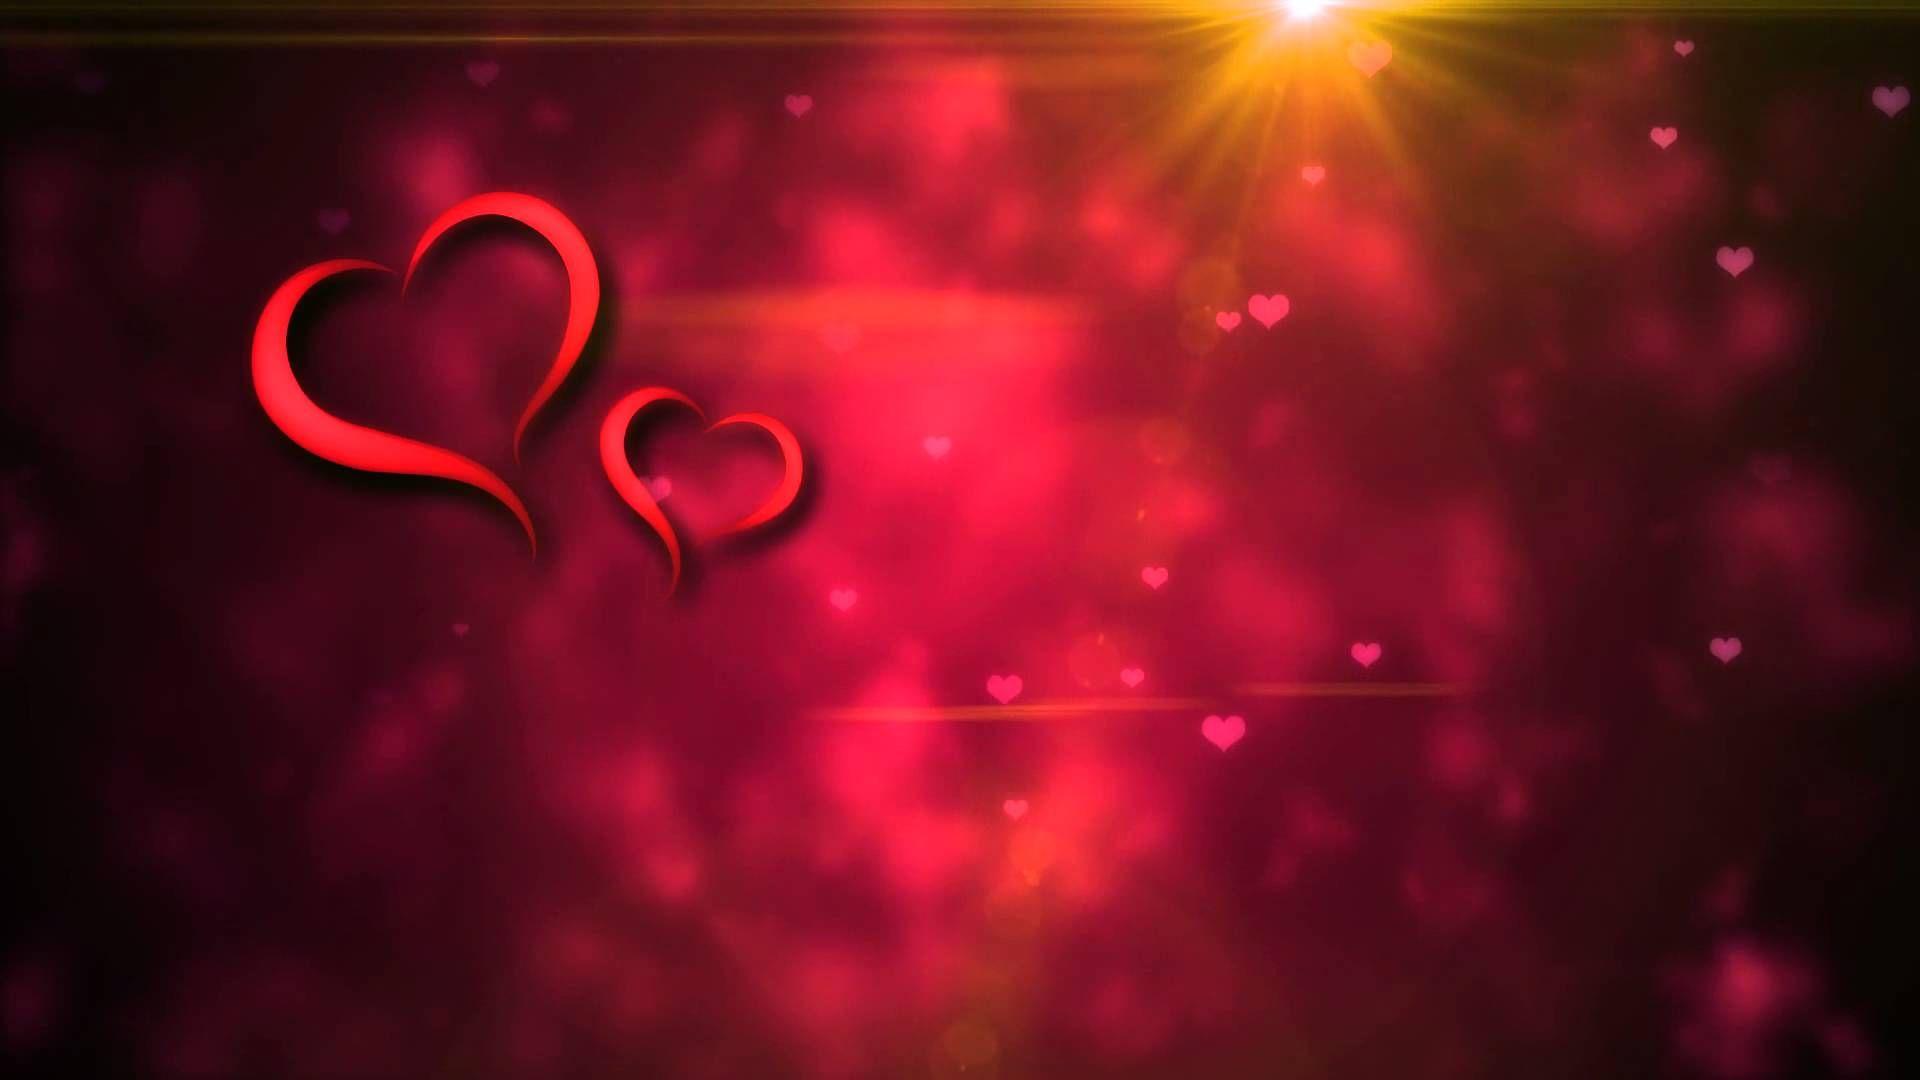 Free Love Motion Background Loop 1080p Hd Wedding Loop For Title Projects Wedding Background Love Background Images Wedding Background Wallpaper